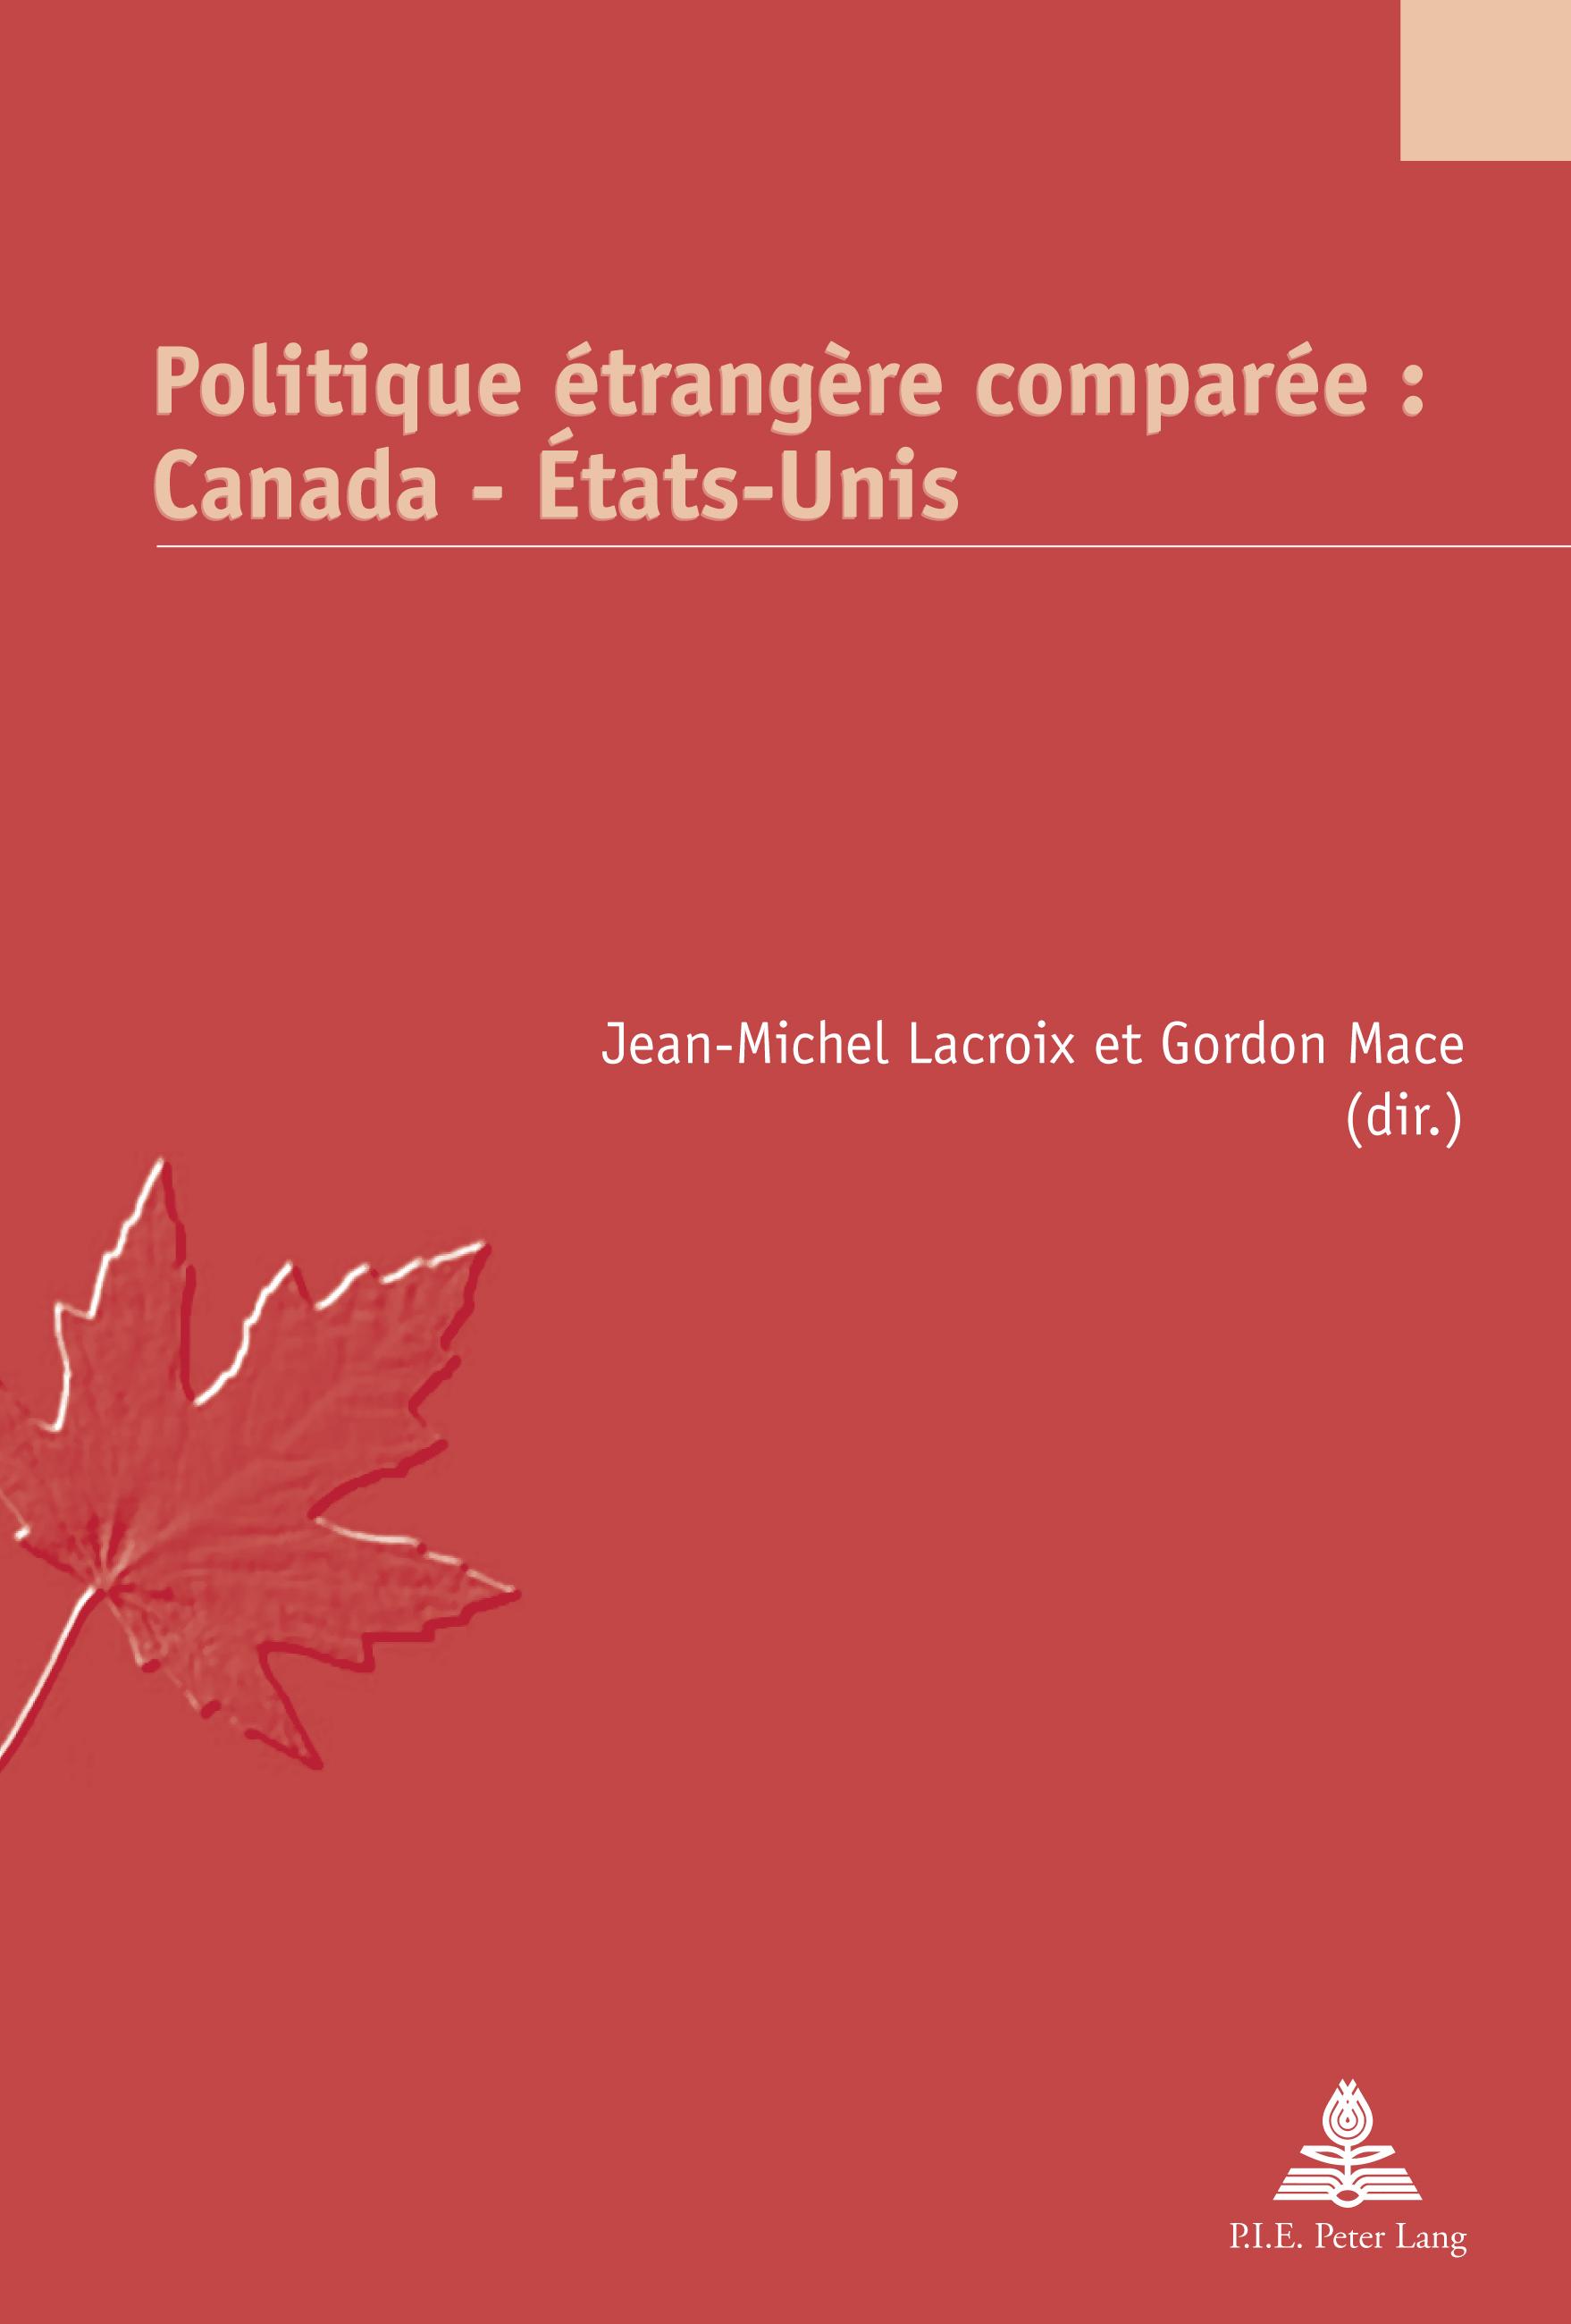 POLITIQUE ETRANGERE COMPAREE : CANADA - ETATS-UNIS